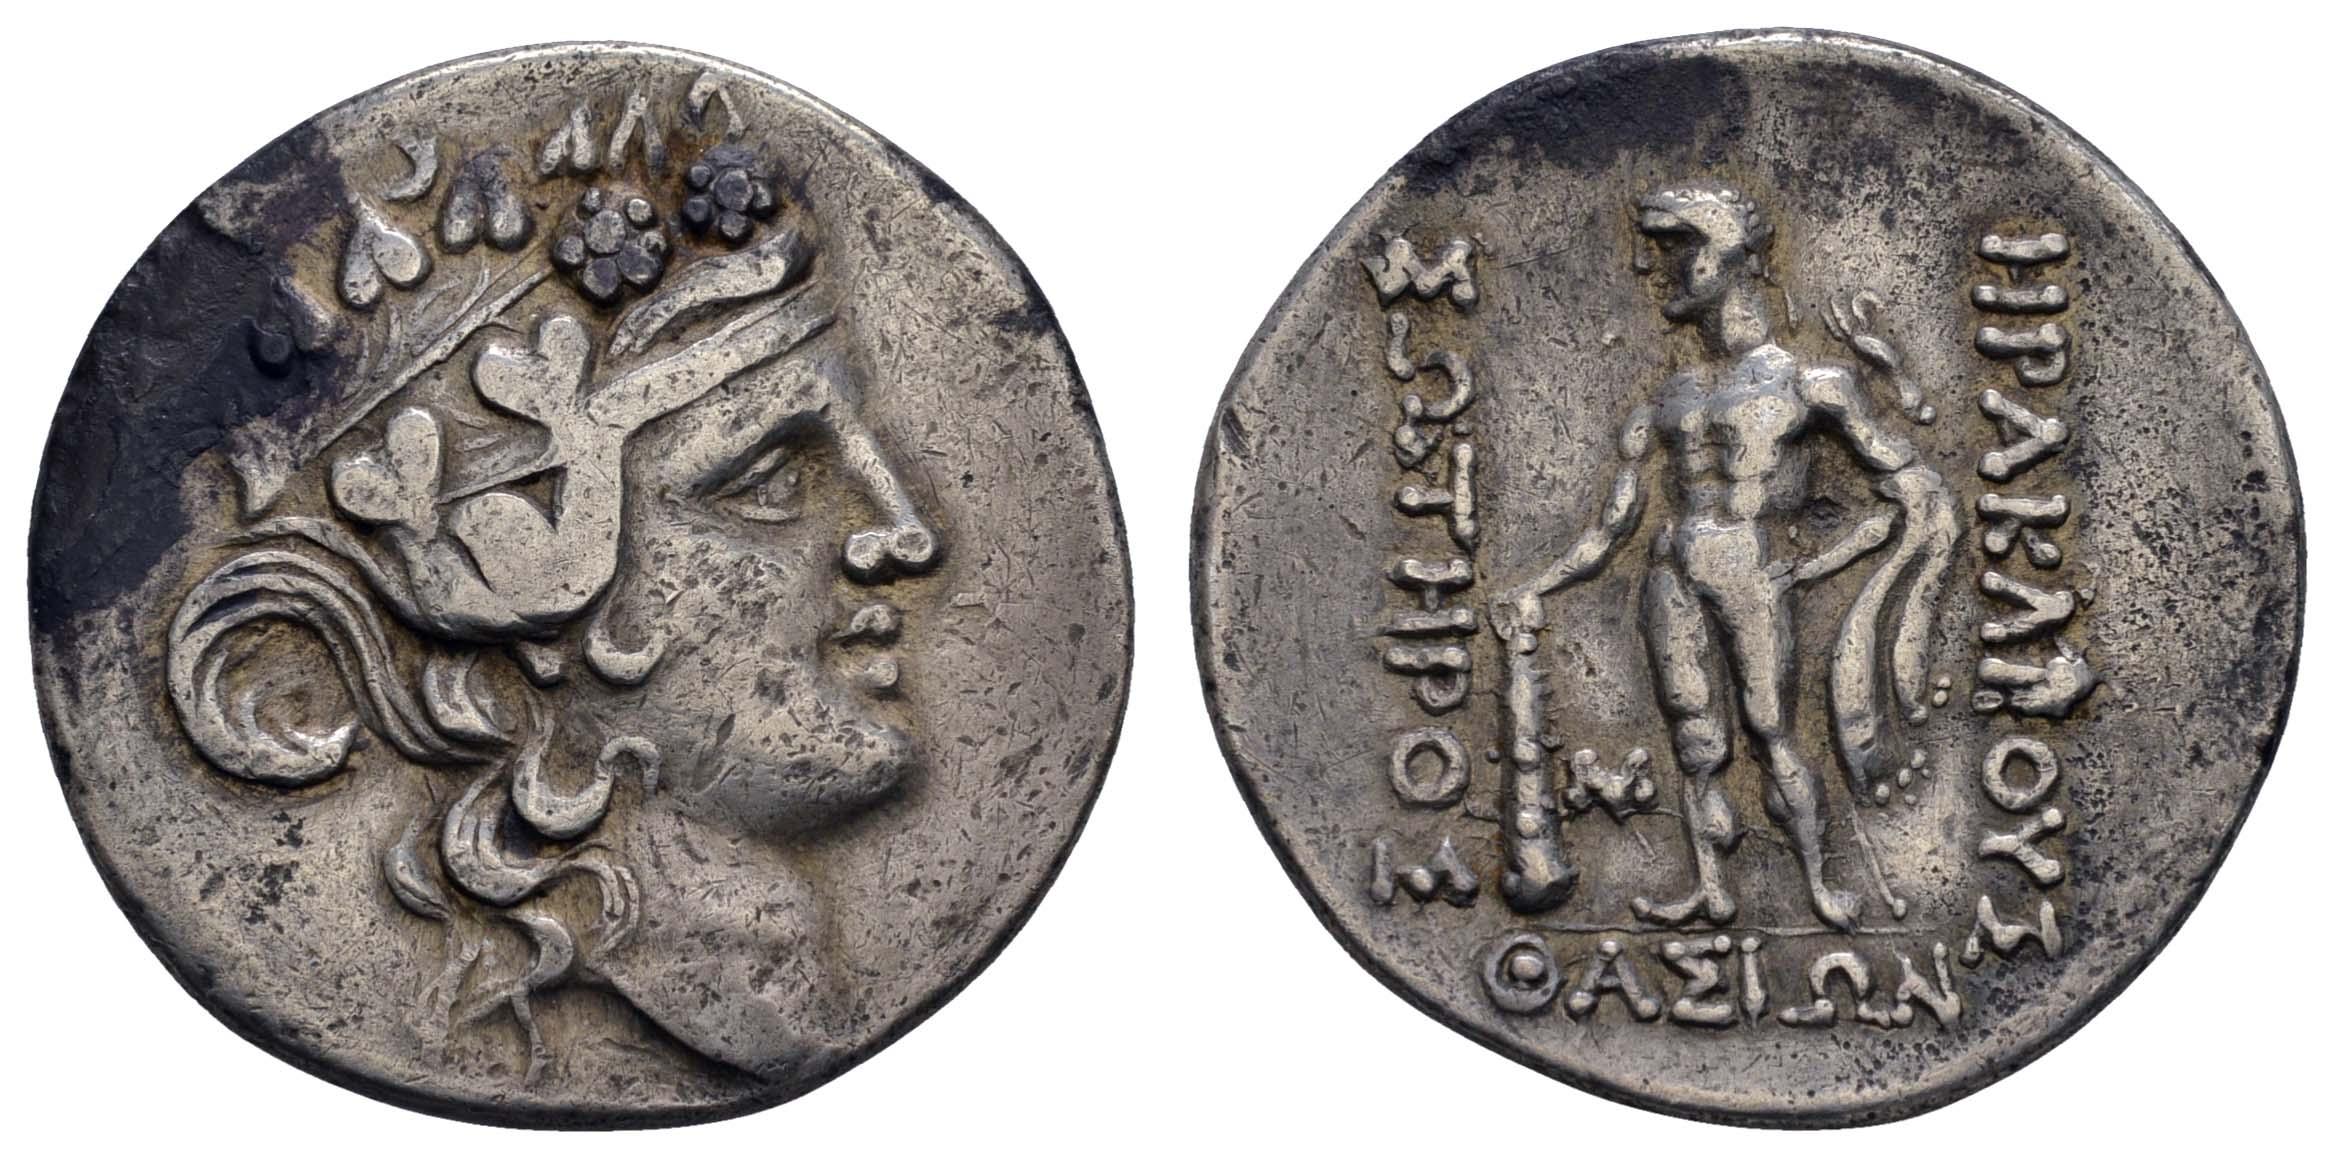 Lot 19 - Antike Griechen - Thracia -  Auktionshaus Ulrich Felzmann GmbH & Co. KG Coins single lots